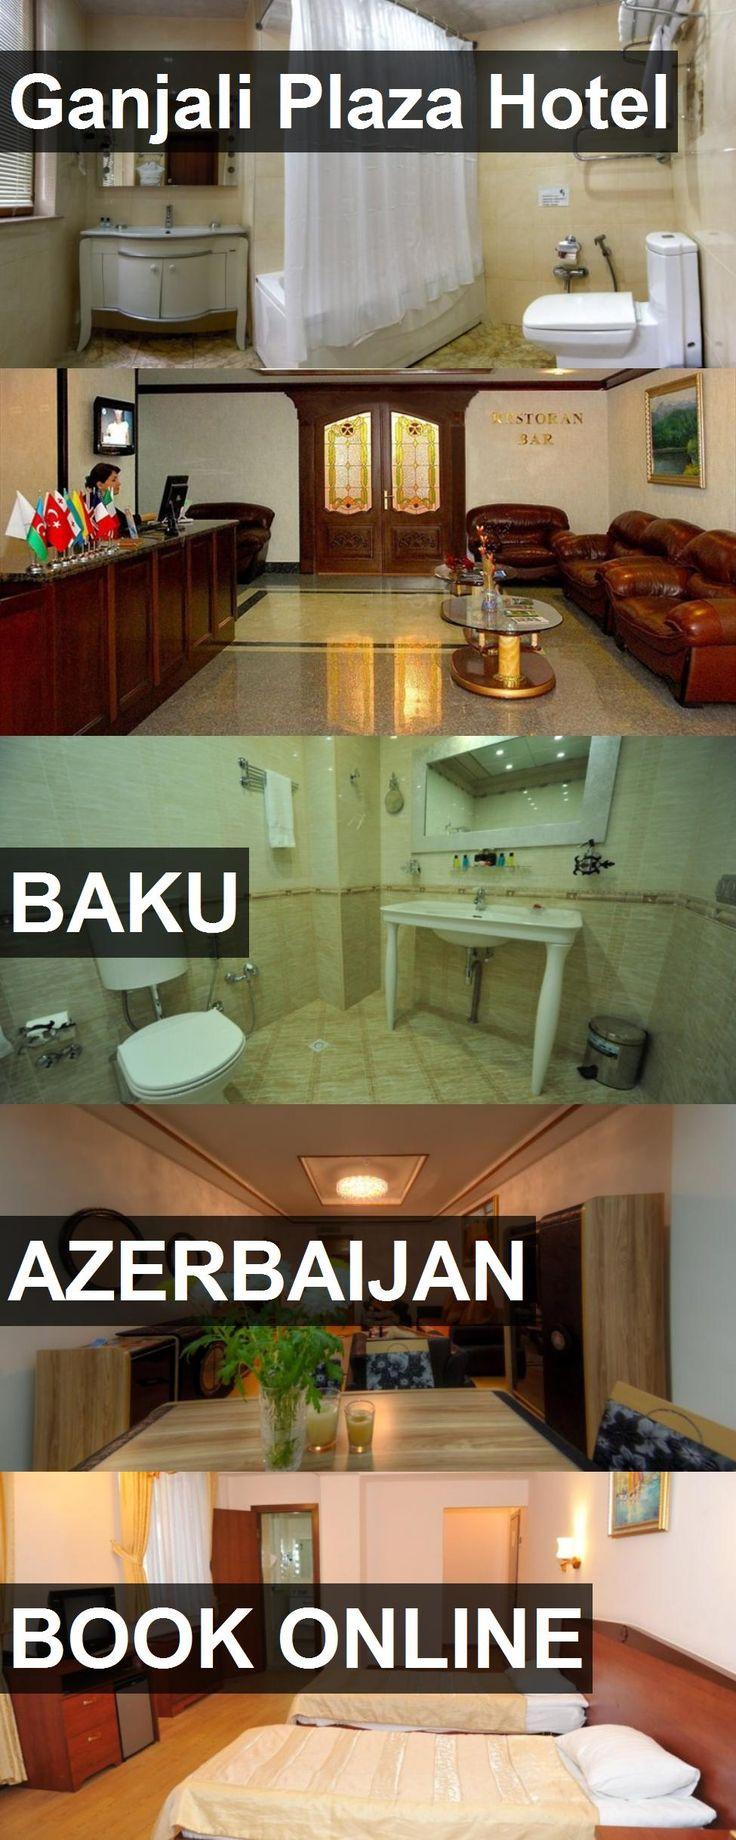 Hotel Ganjali Plaza Hotel in Baku, Azerbaijan. For more information, photos, reviews and best prices please follow the link. #Azerbaijan #Baku #hotel #travel #vacation